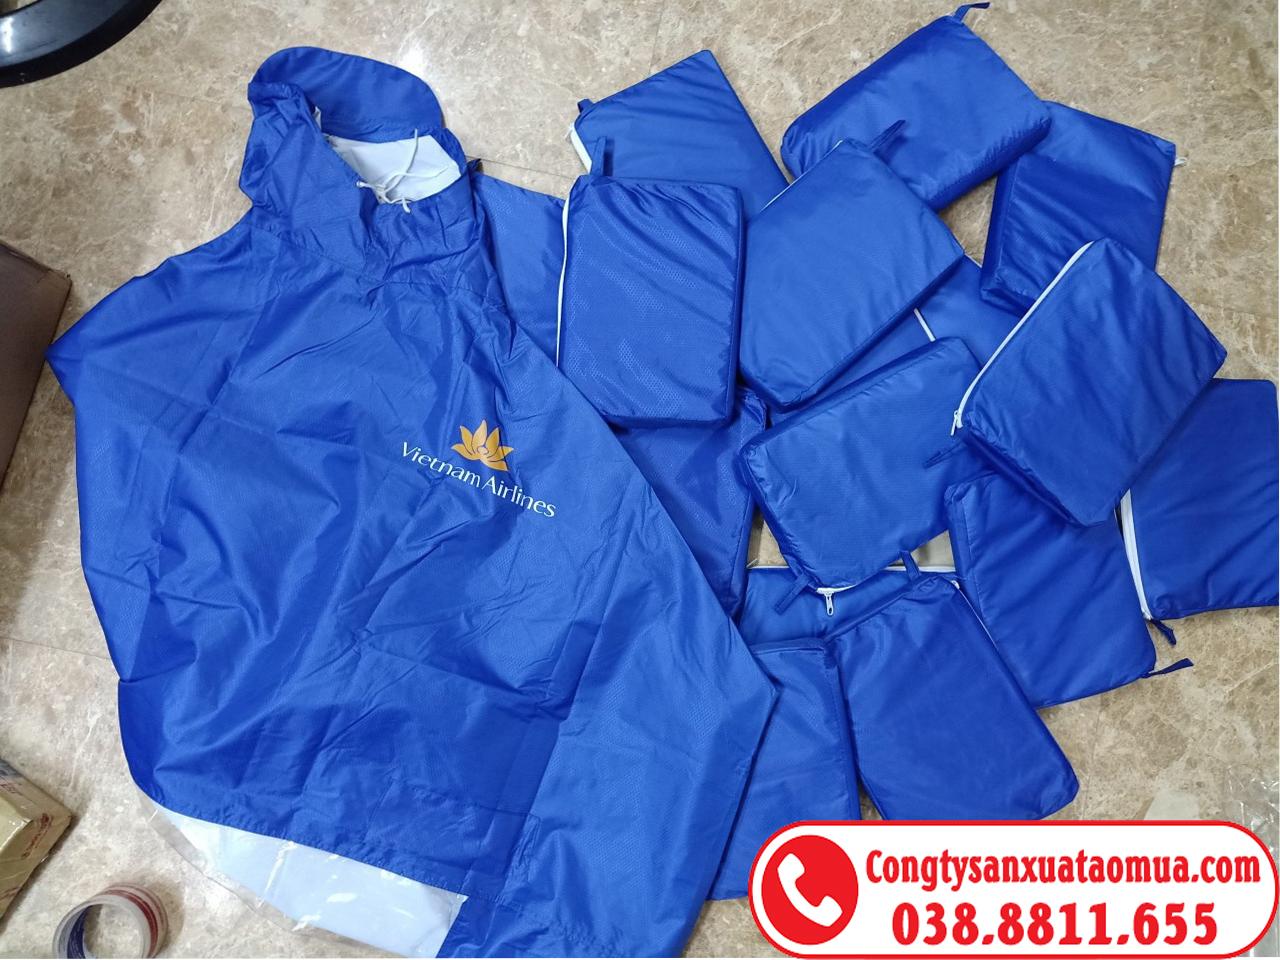 sản xuất áo mưa in logo